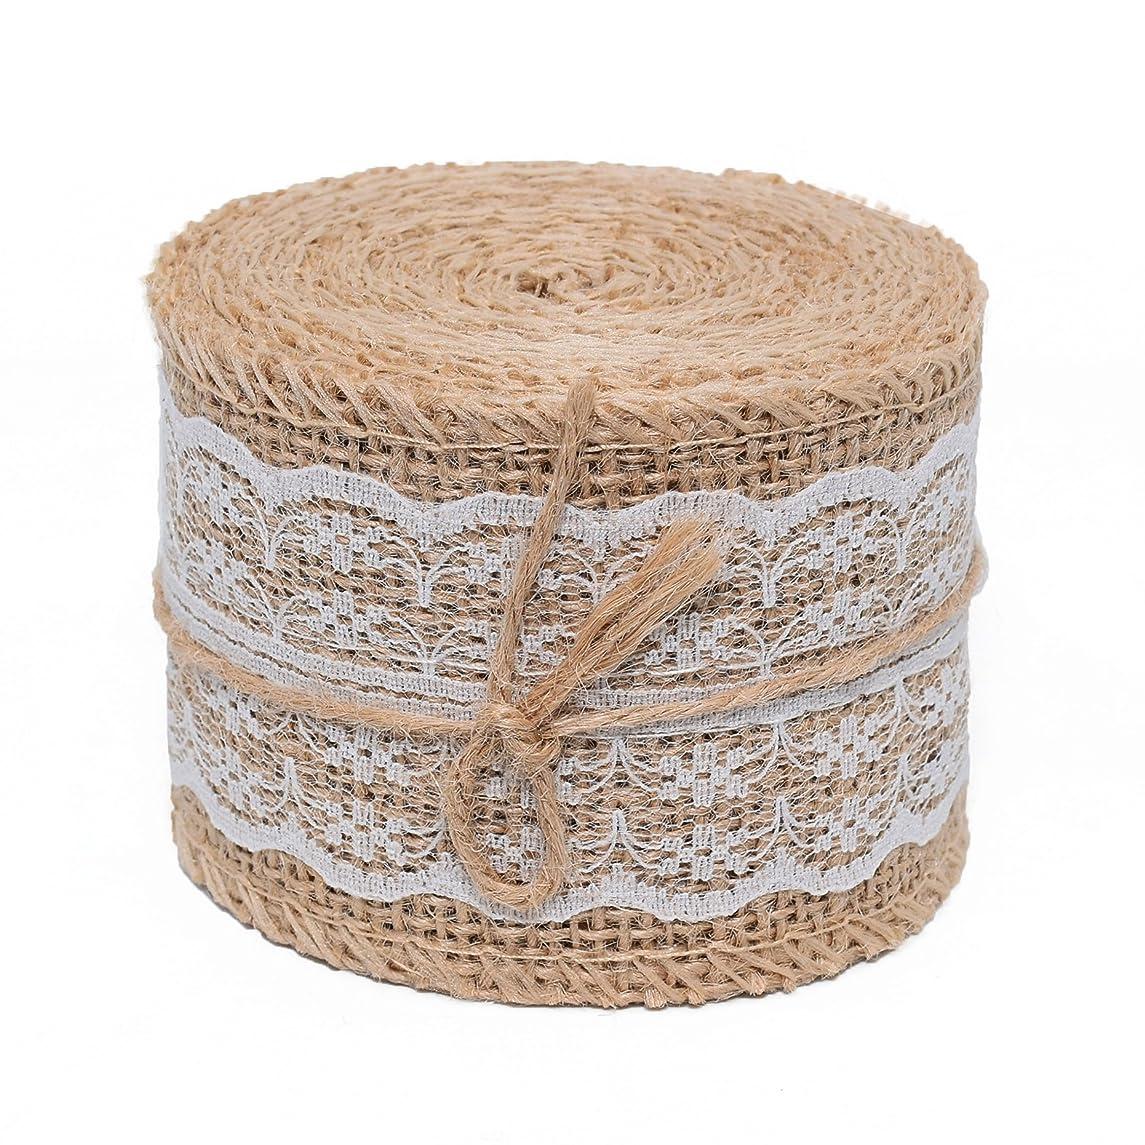 Burlap Ribbon Roll White Lace Trims Tape Natural Jute-2.34WIDTH156LONG INCH